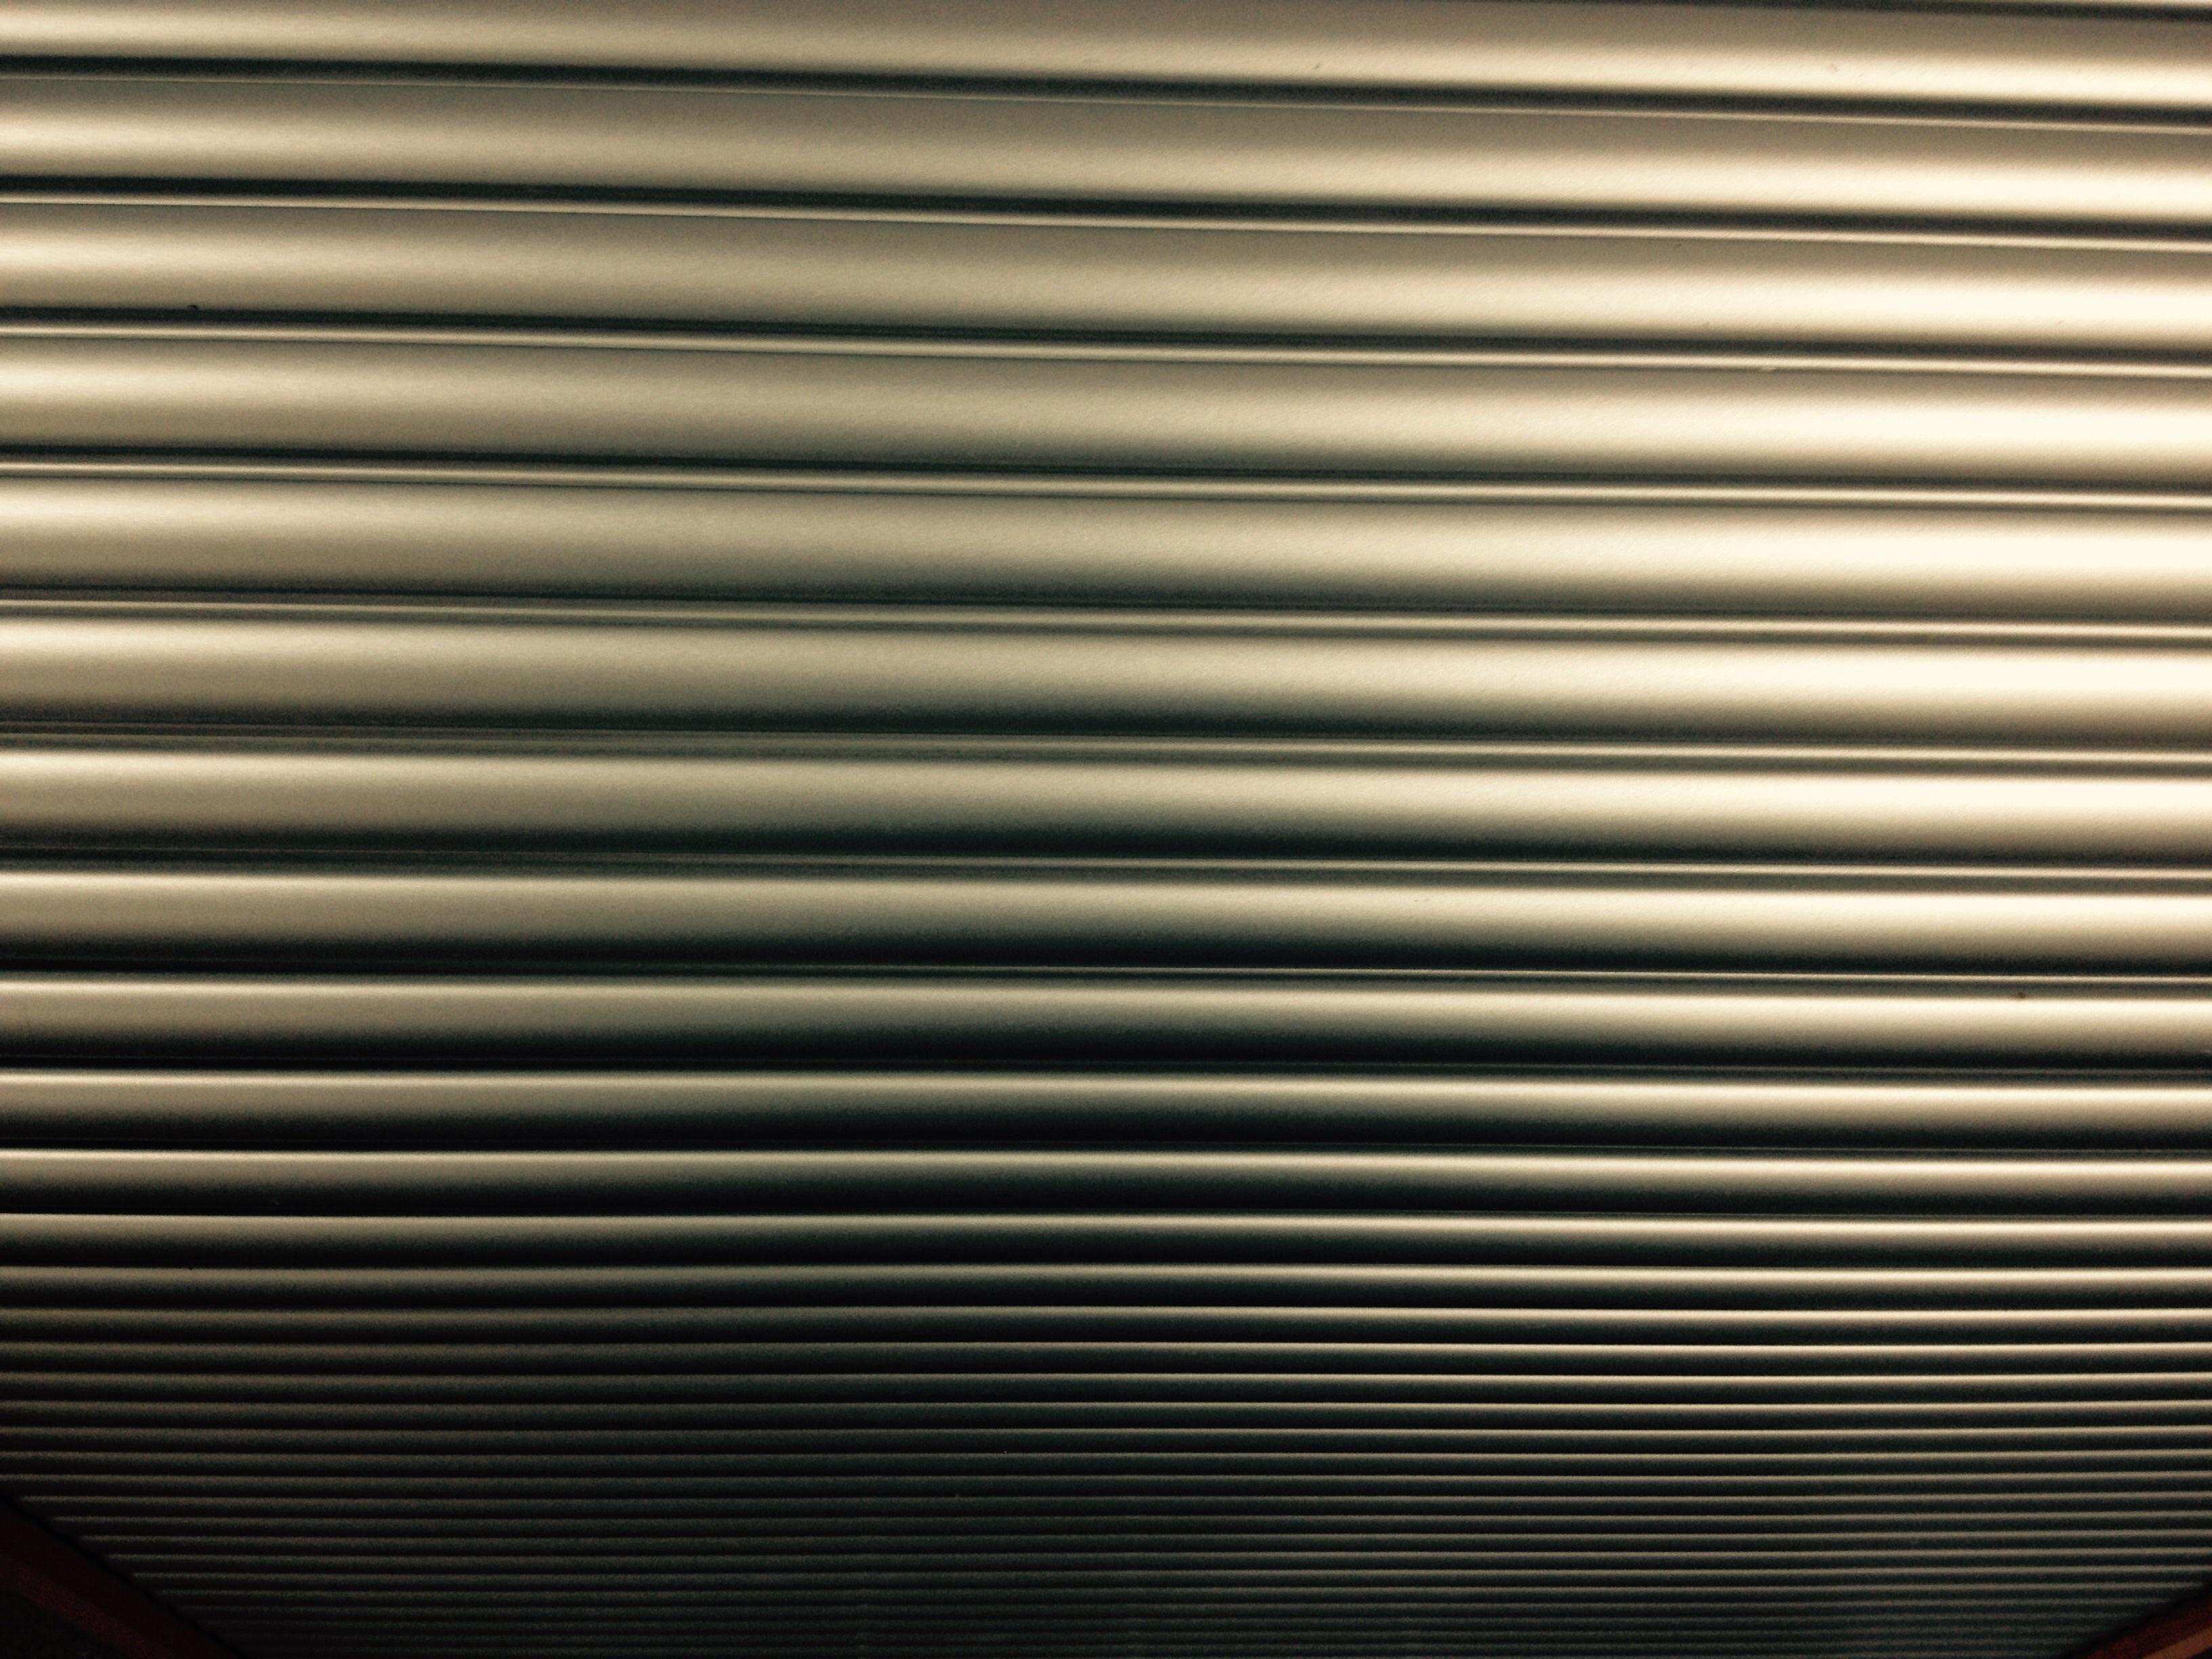 Light Structure Wood Plastic Steel Line Metal Office Lighting Material  Interior Design Cabinet Grey Shutters Design